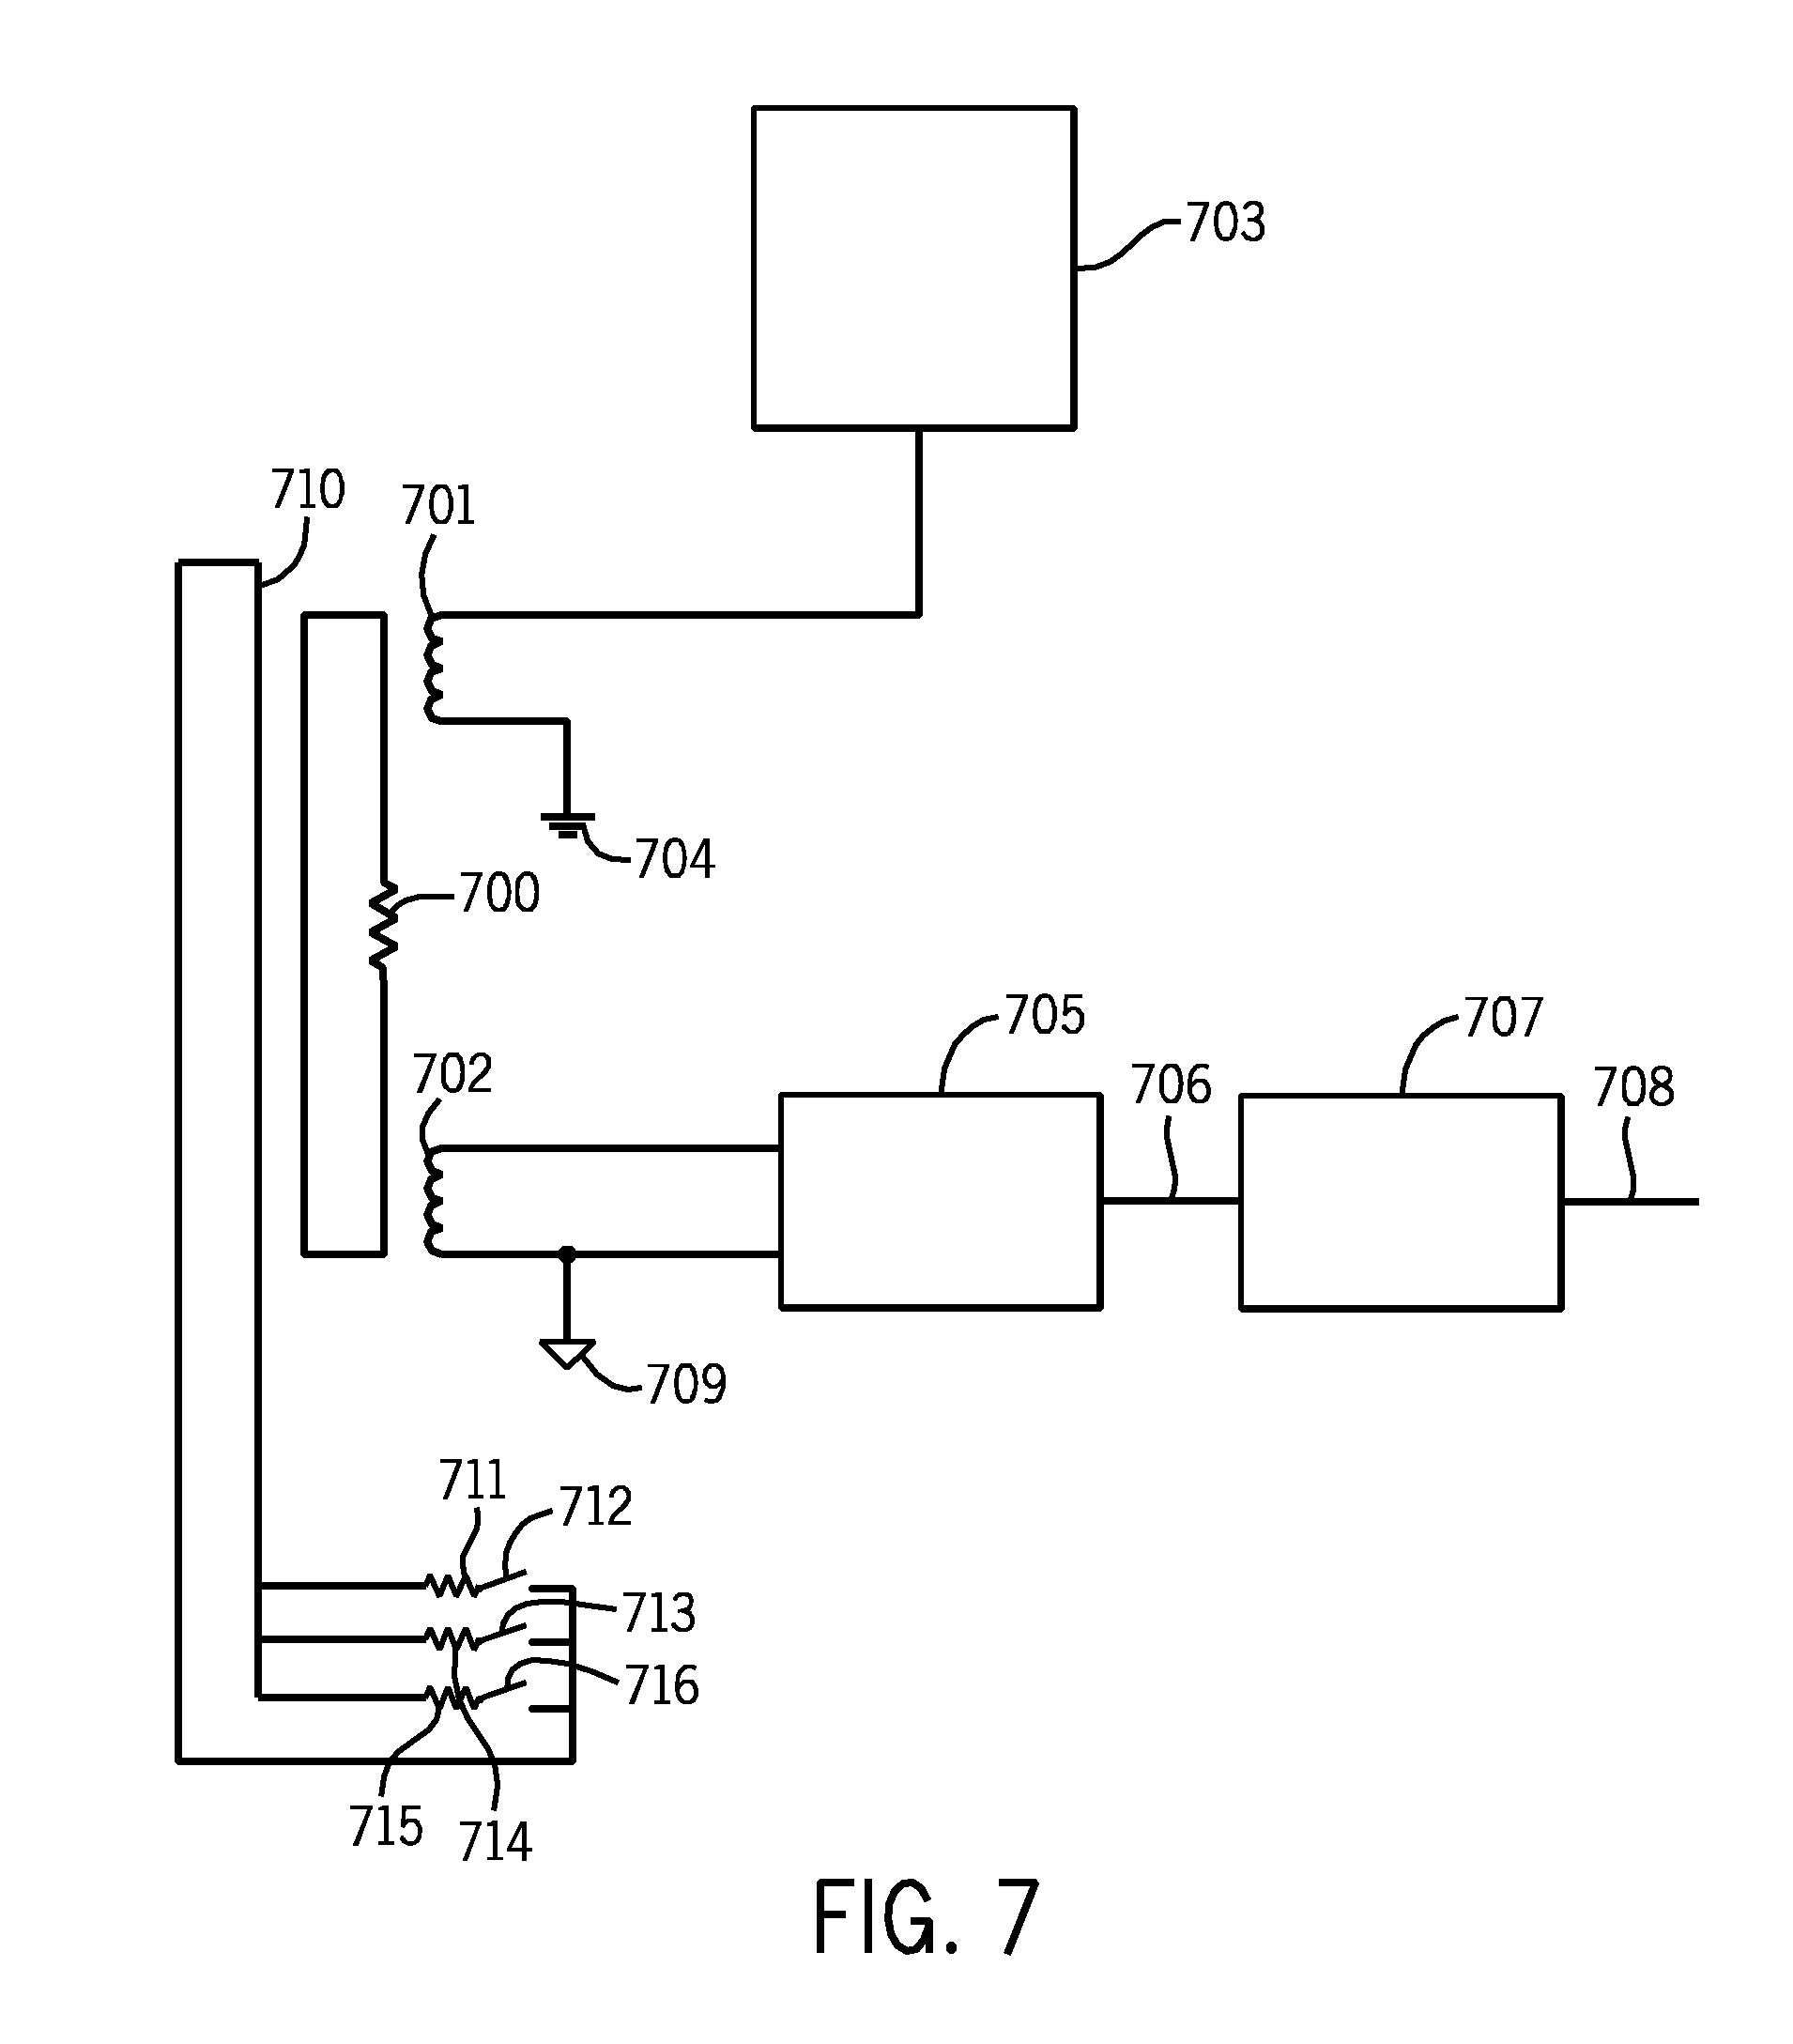 Wiring Diagram Capacitive Probe Auto Electrical Water Tank Overflow Alarm Circuit Engineersgarage Conductivity Sensor 34